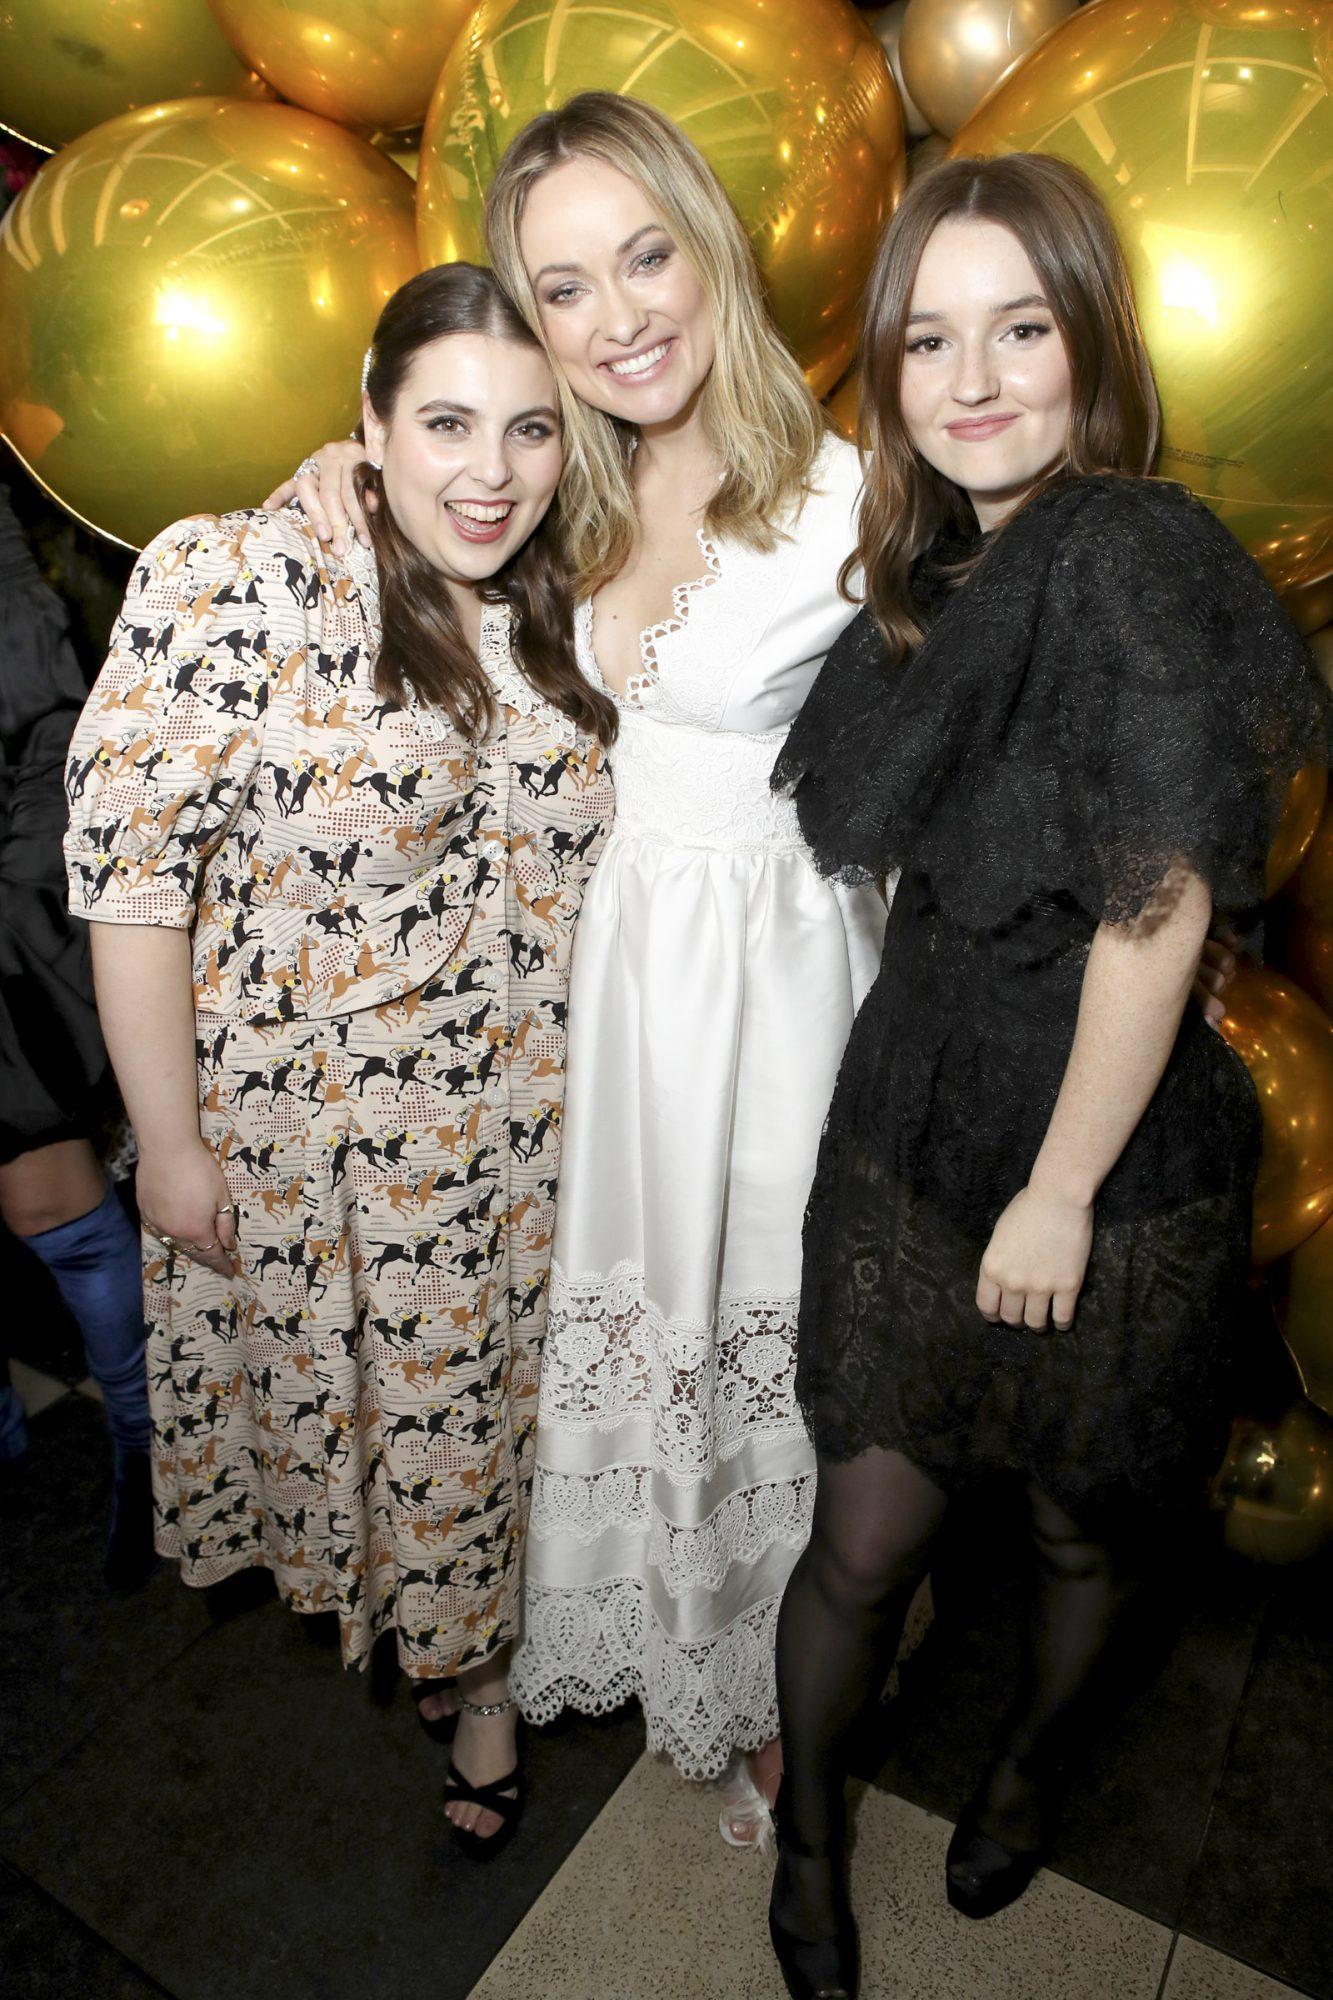 Beanie Feldstein, Olivia Wilde and Kaitlyn Dever